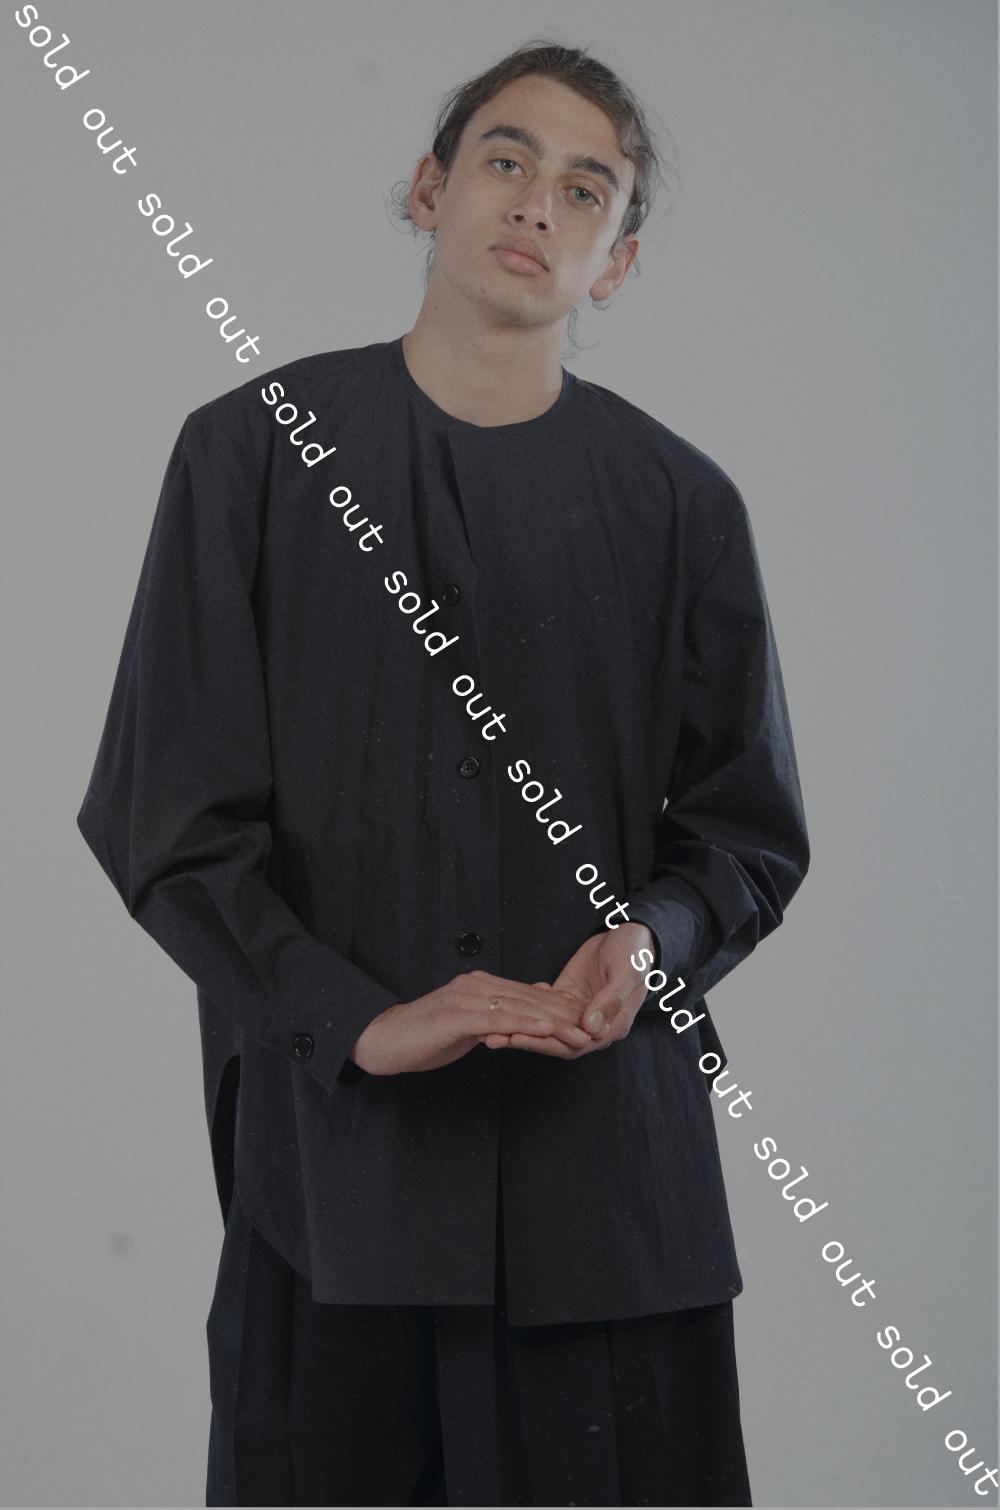 joseph-hollebon-collarless-shirt-agoraphobia